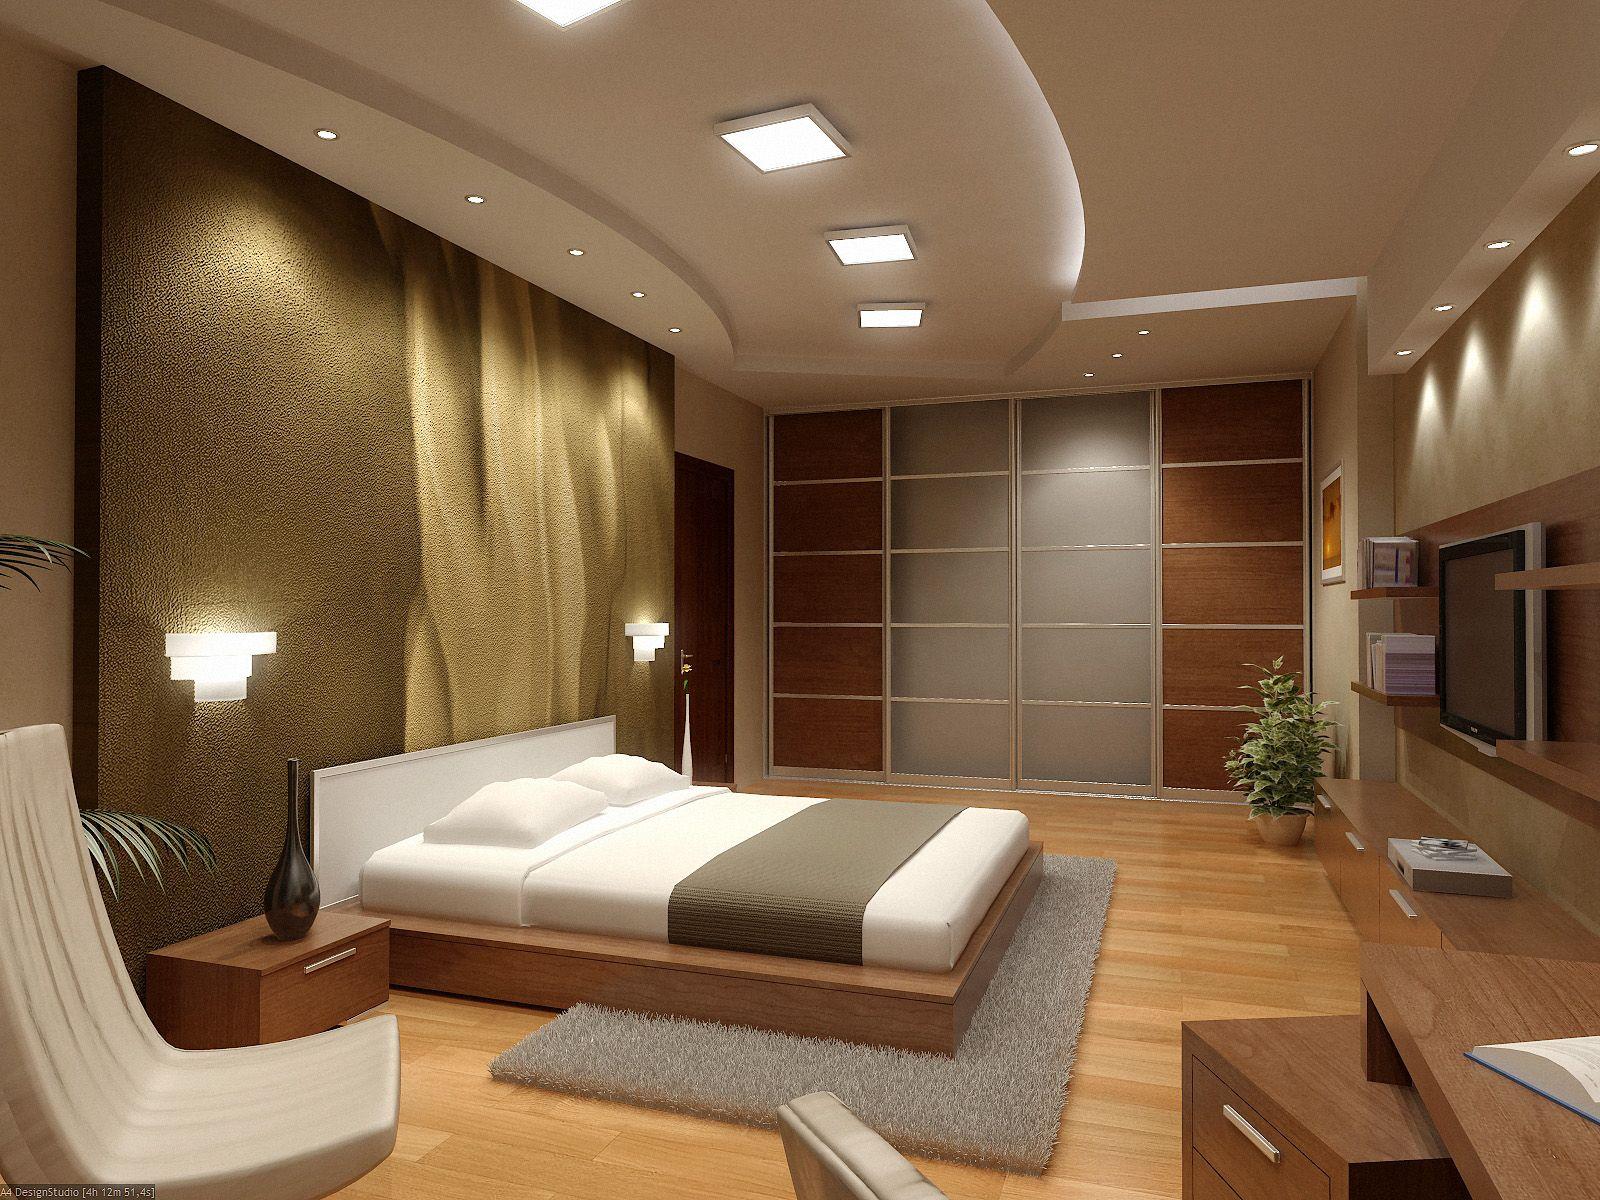 New home designs latest. Modern homes luxury interior designing ideas.